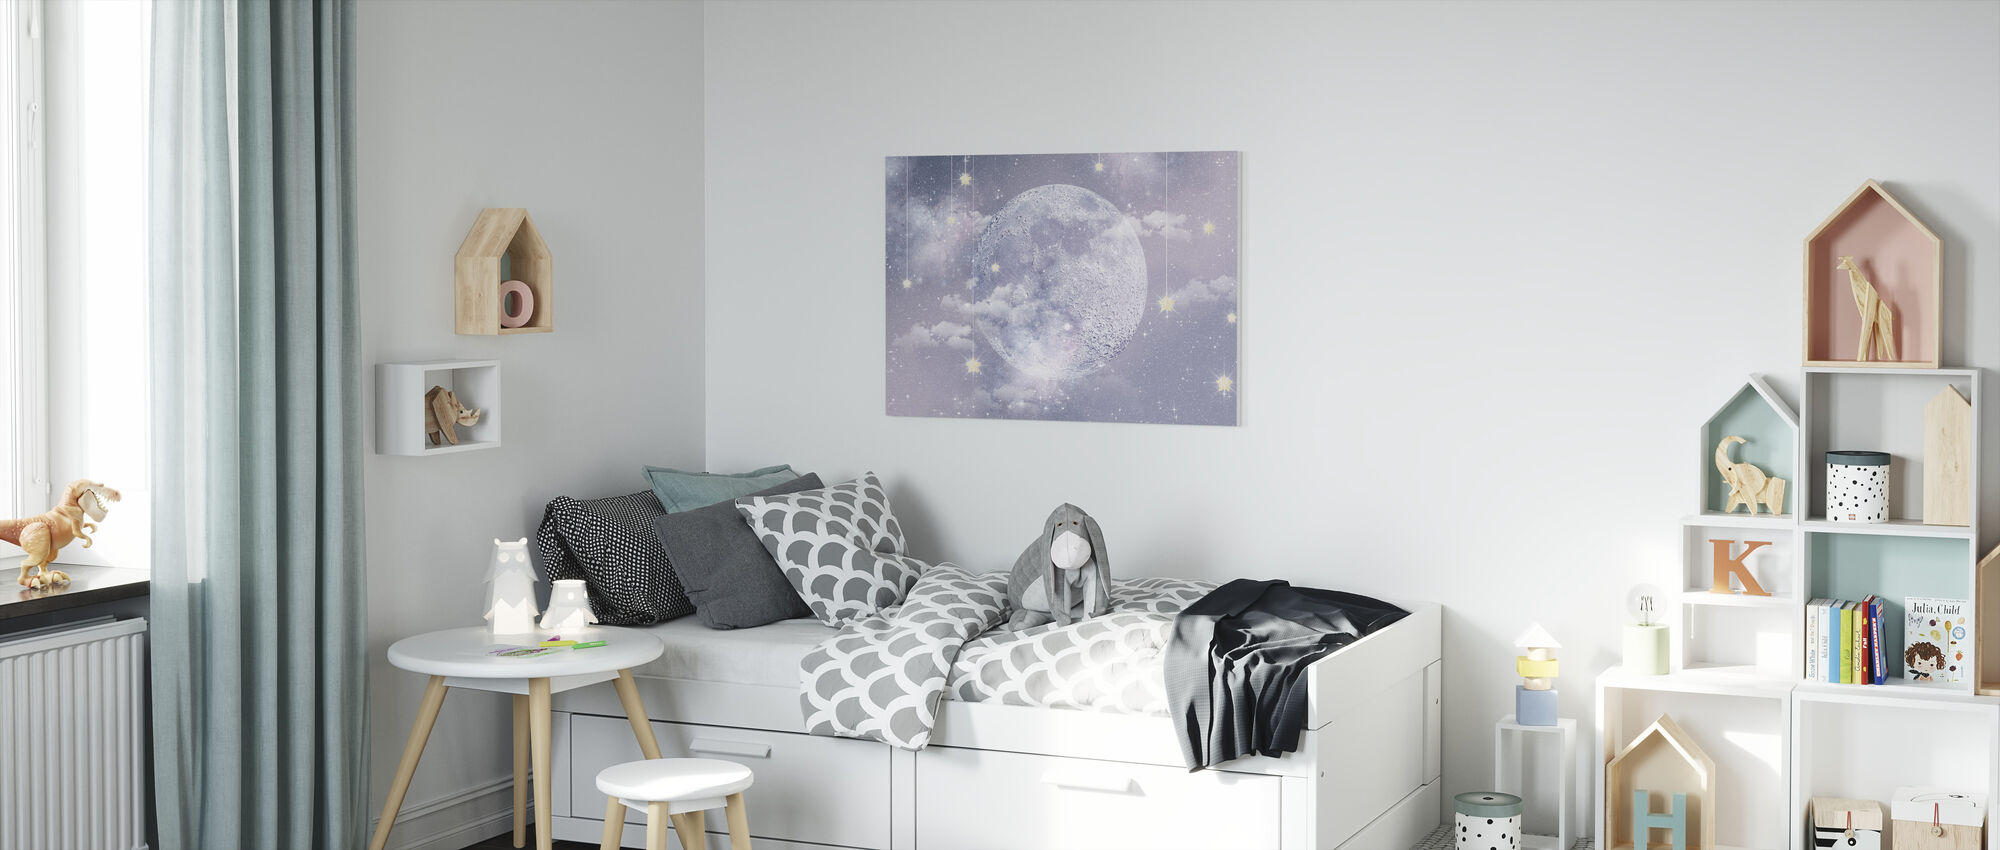 Månen med stjerner - Lerretsbilde - Barnerom